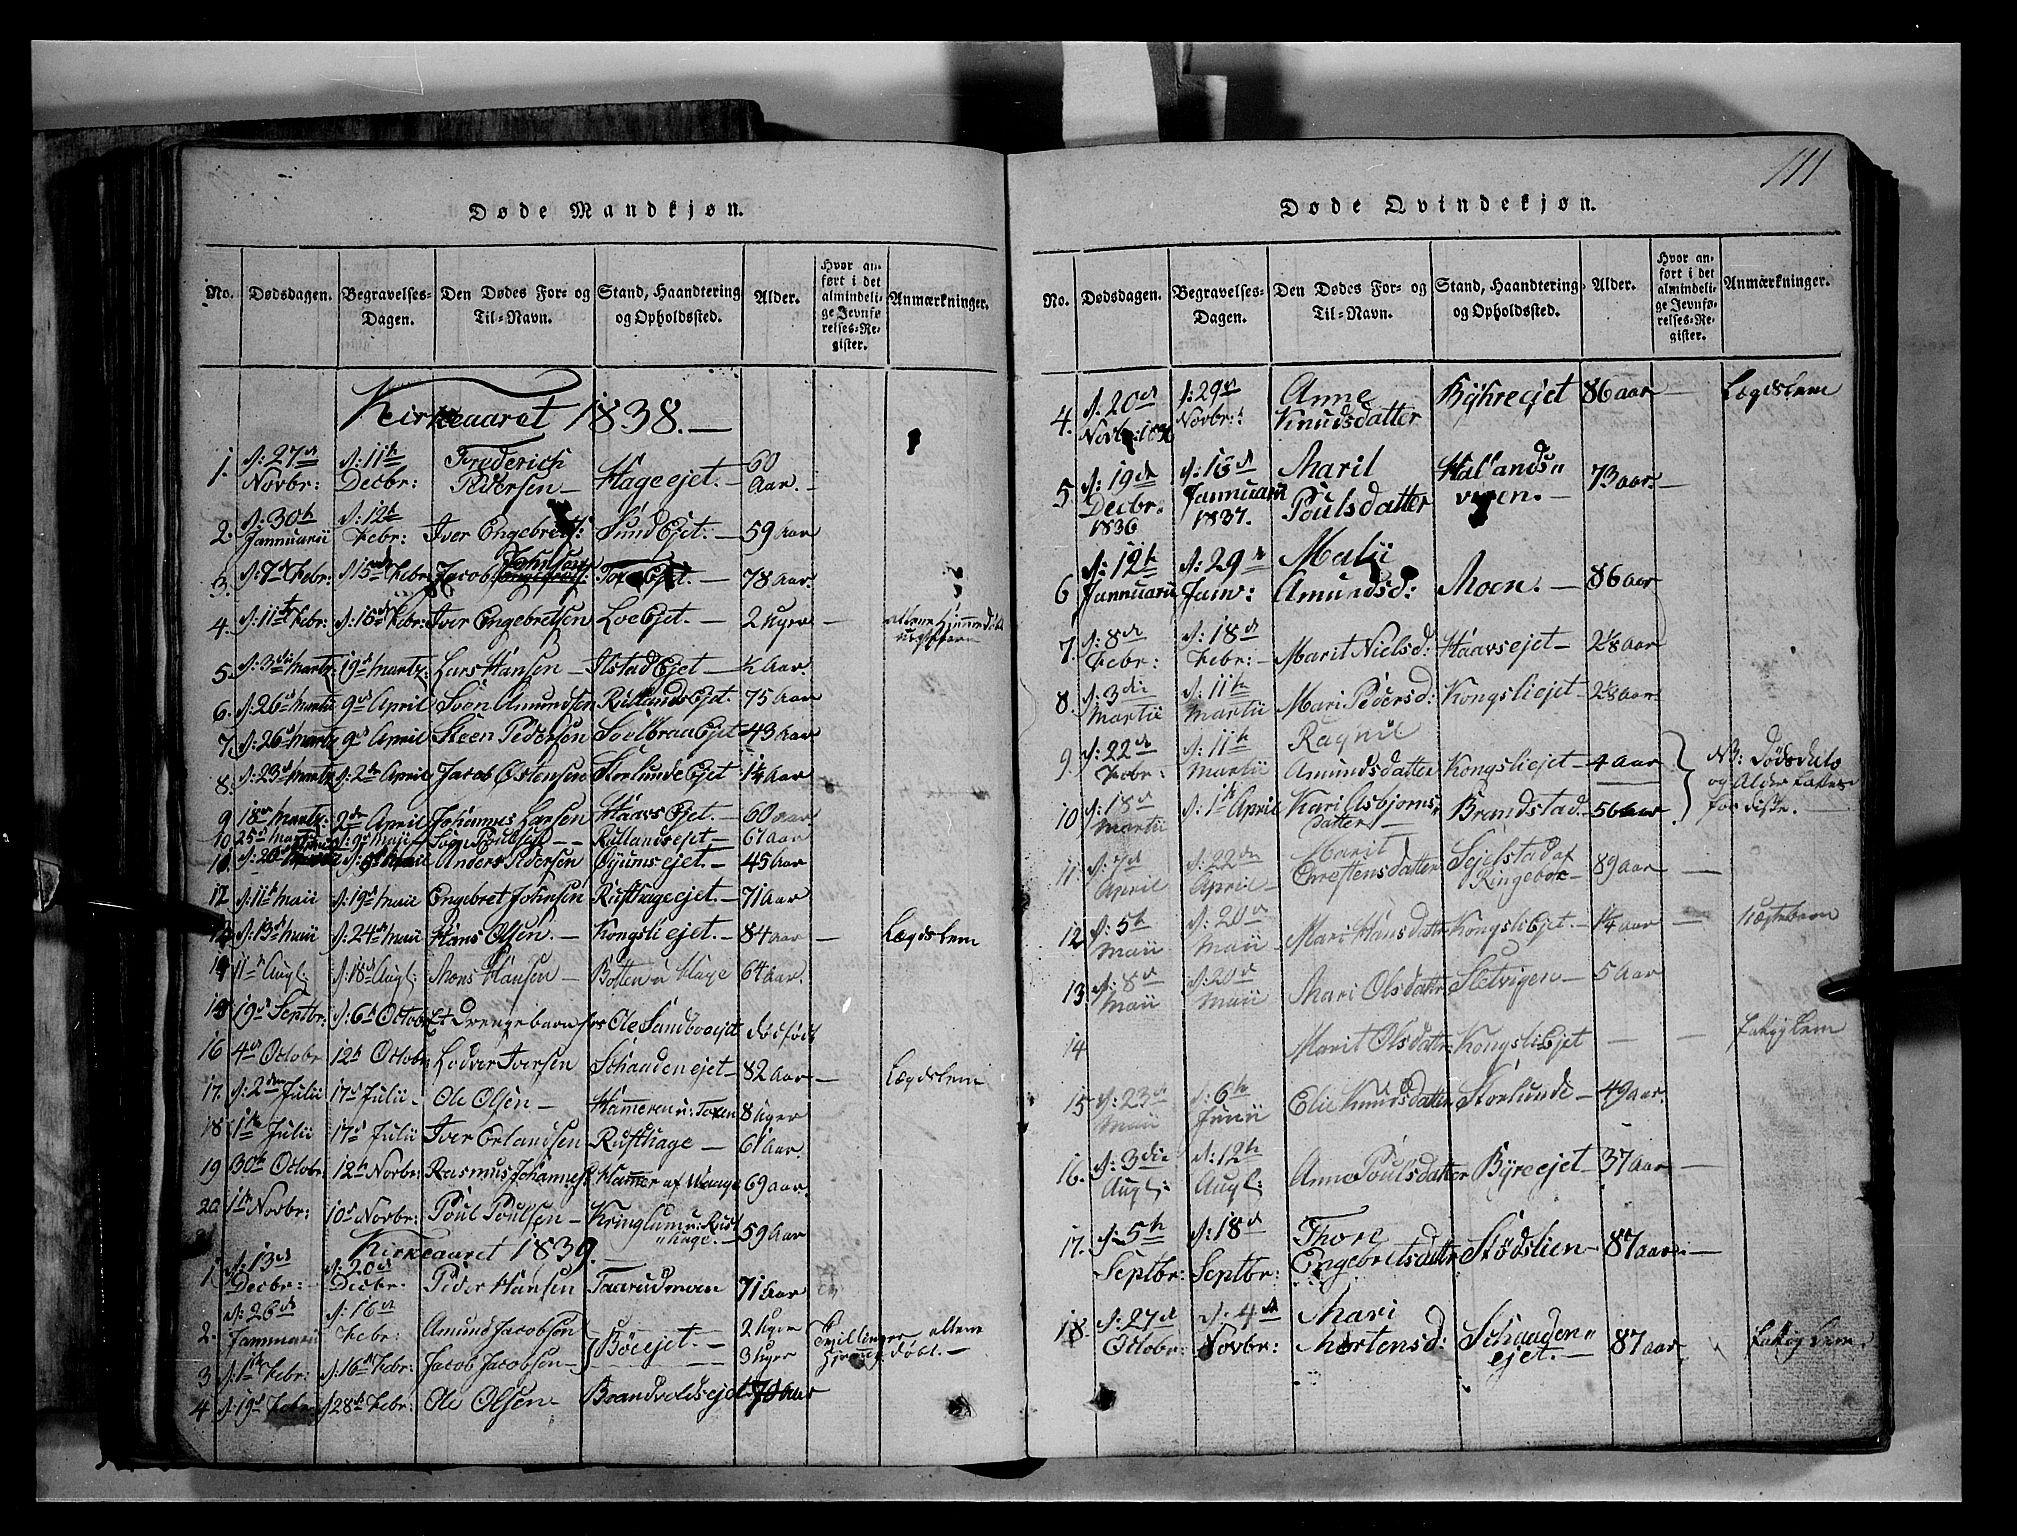 SAH, Fron prestekontor, H/Ha/Hab/L0004: Klokkerbok nr. 4, 1816-1850, s. 111